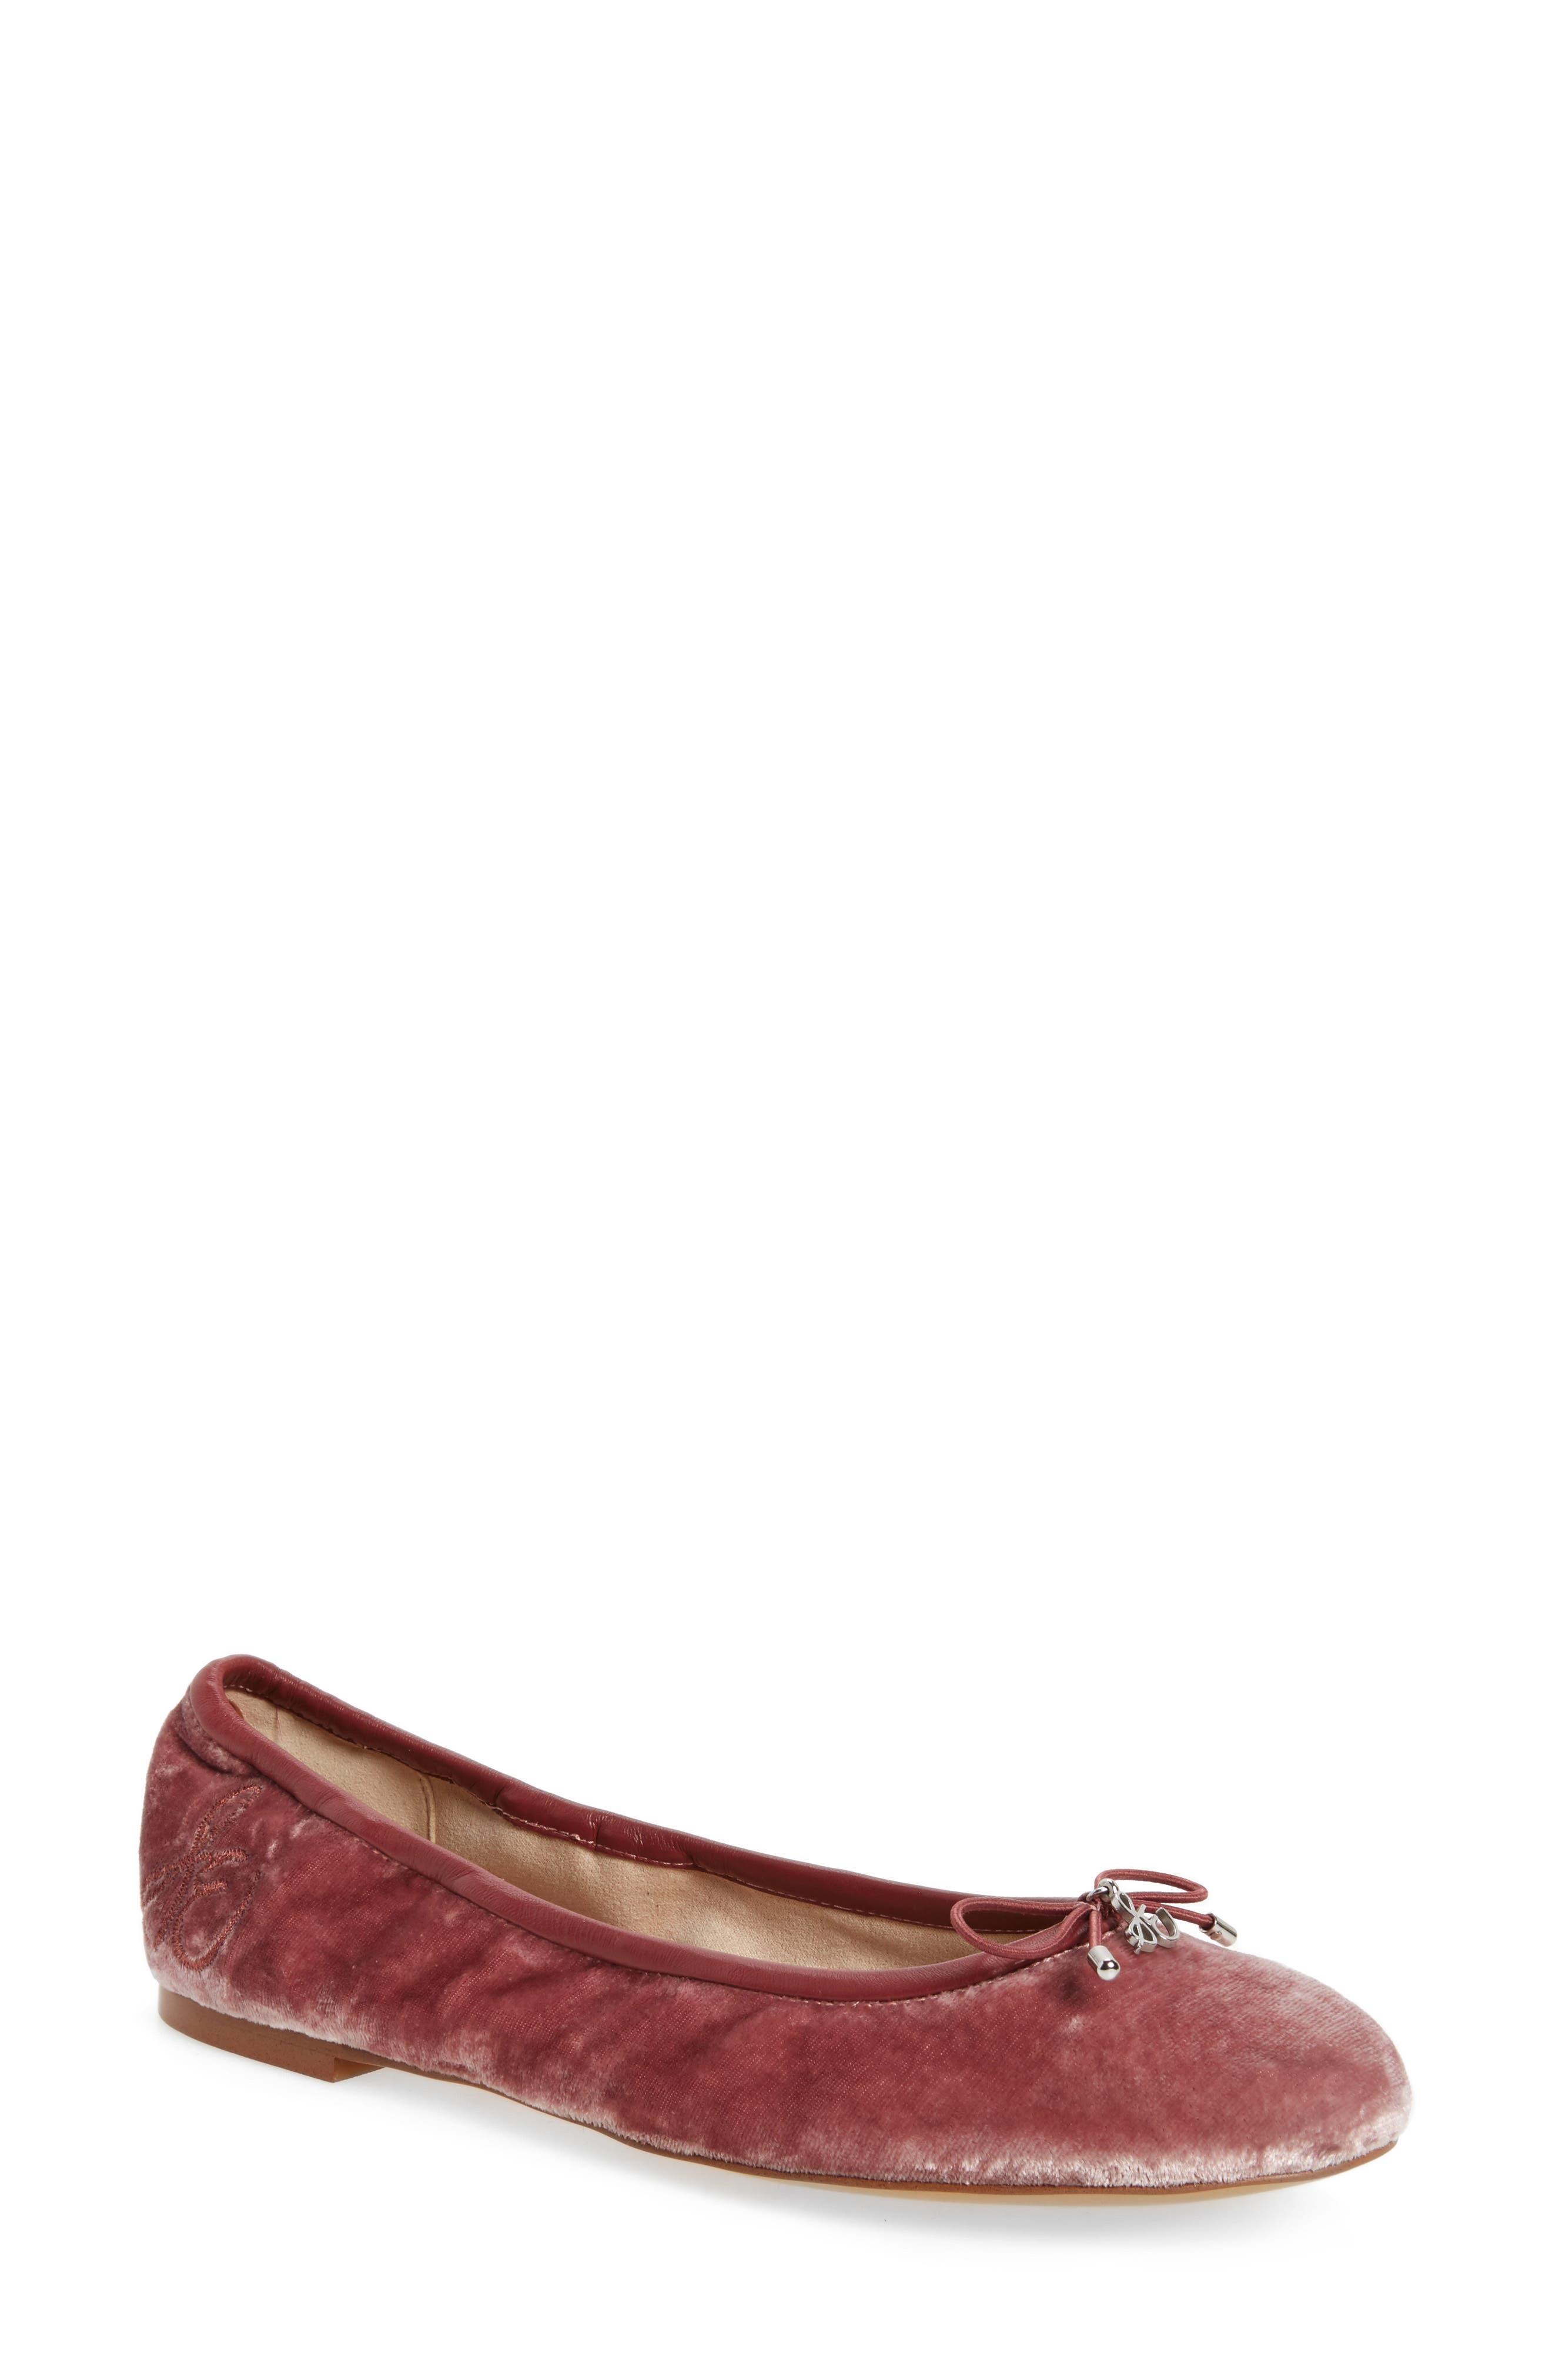 'Felicia' Flat,                             Main thumbnail 1, color,                             Faded Rose